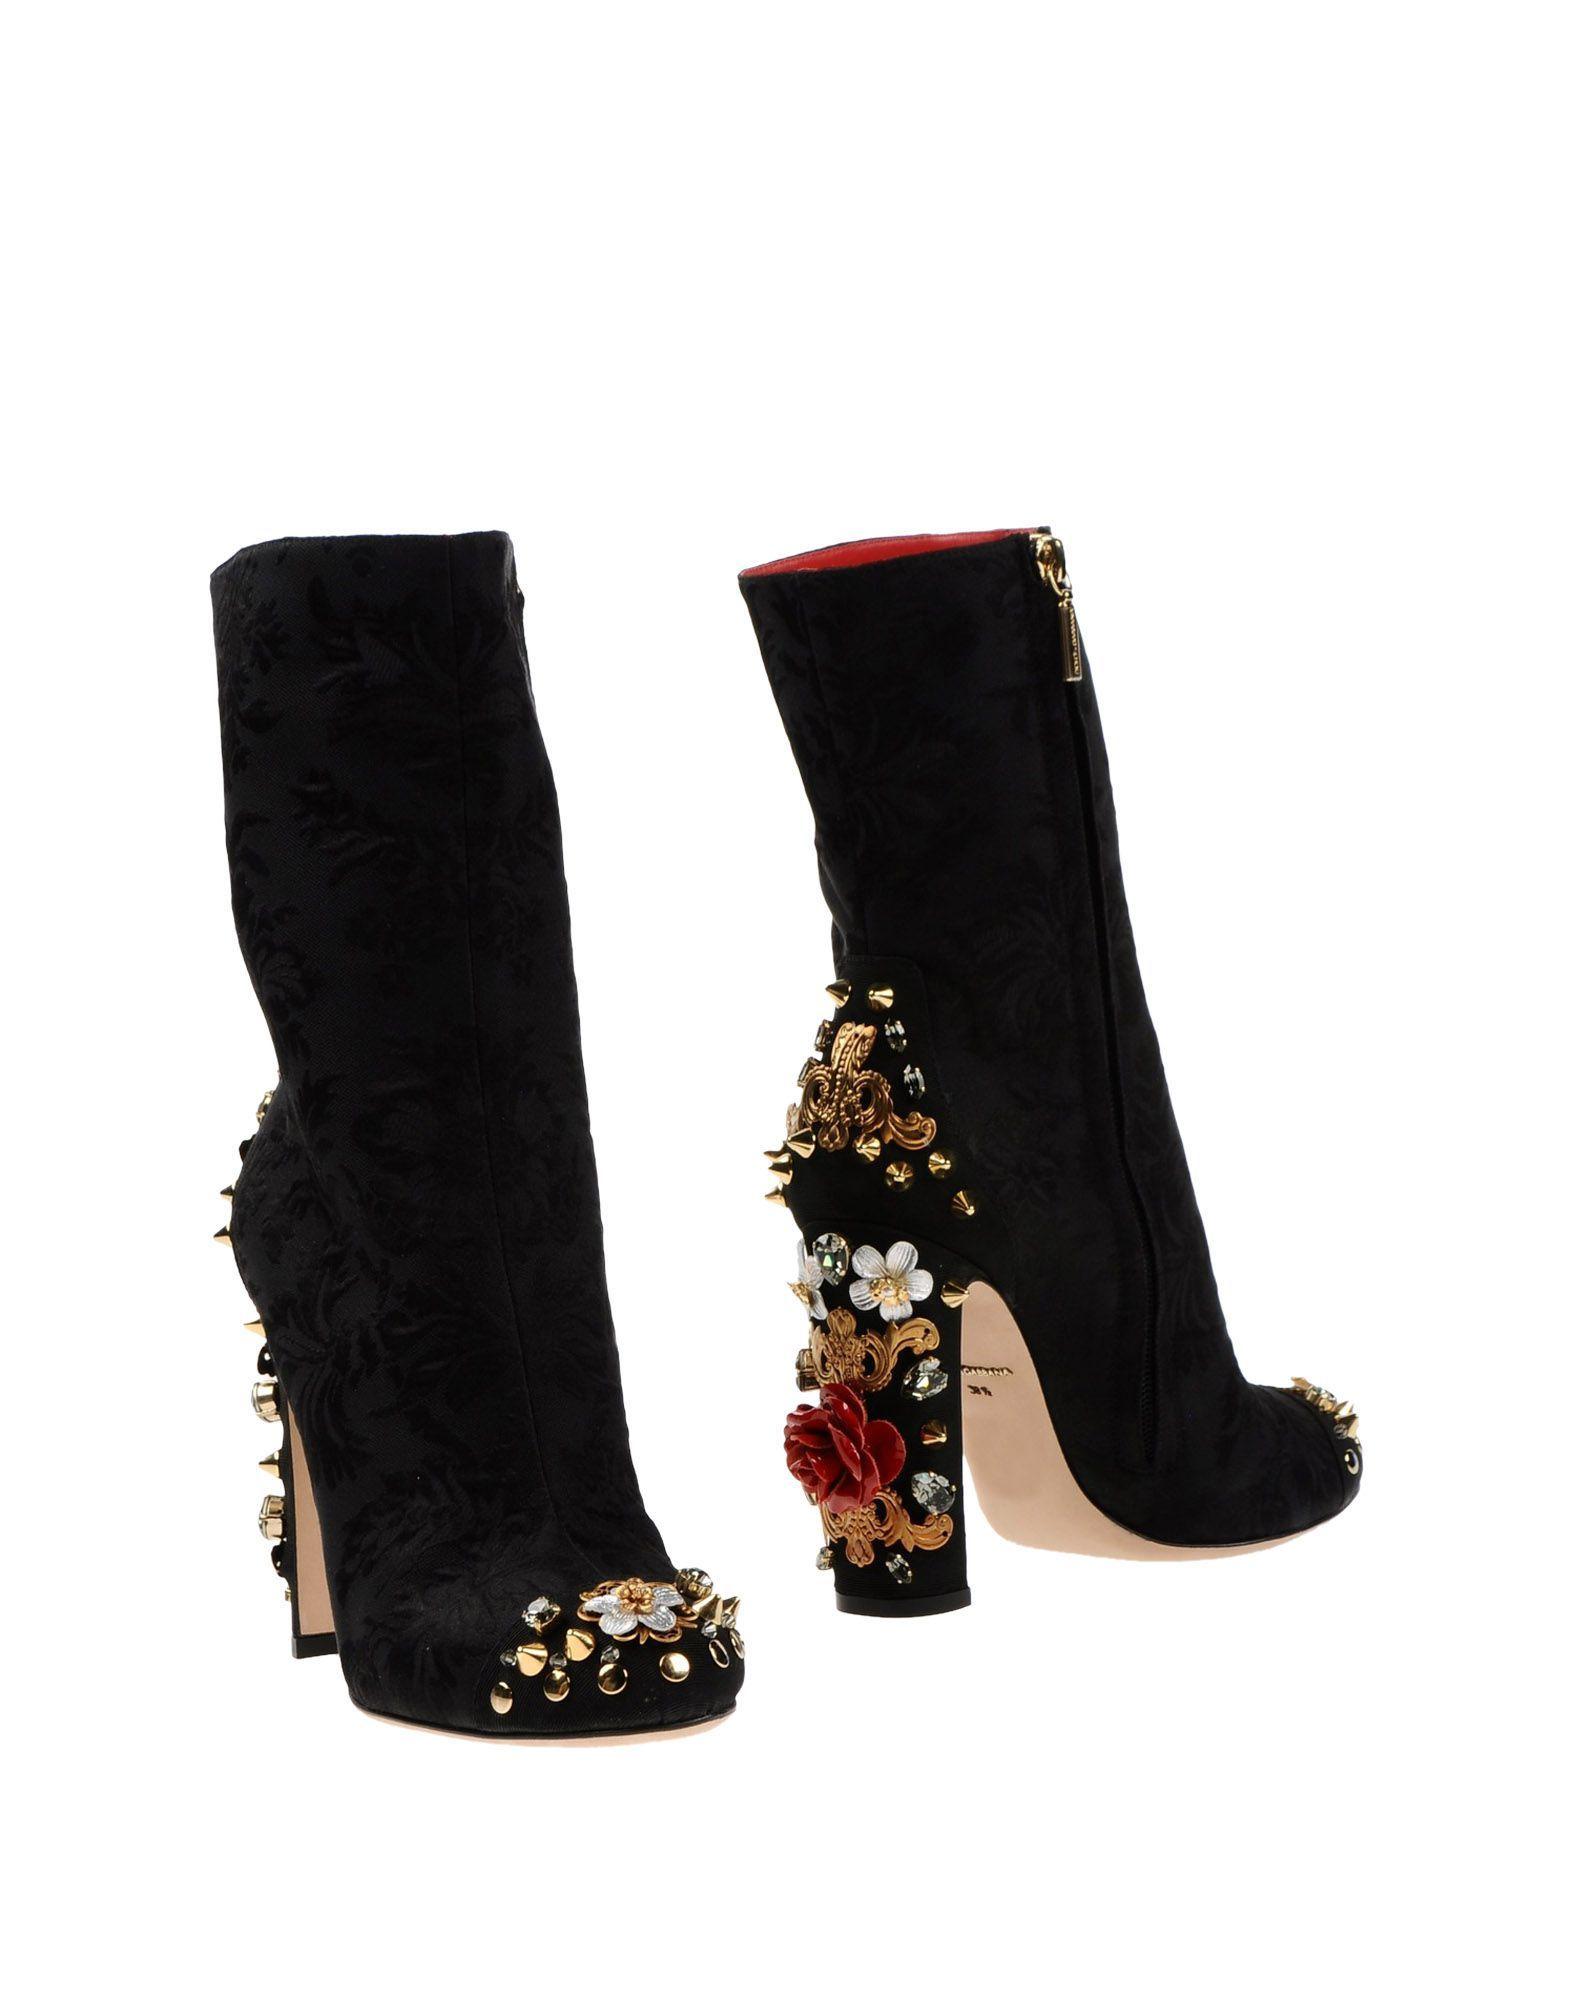 Gabbana Dolceamp; Stiefeletten Damen Stiefelette ymN0Ov8nw